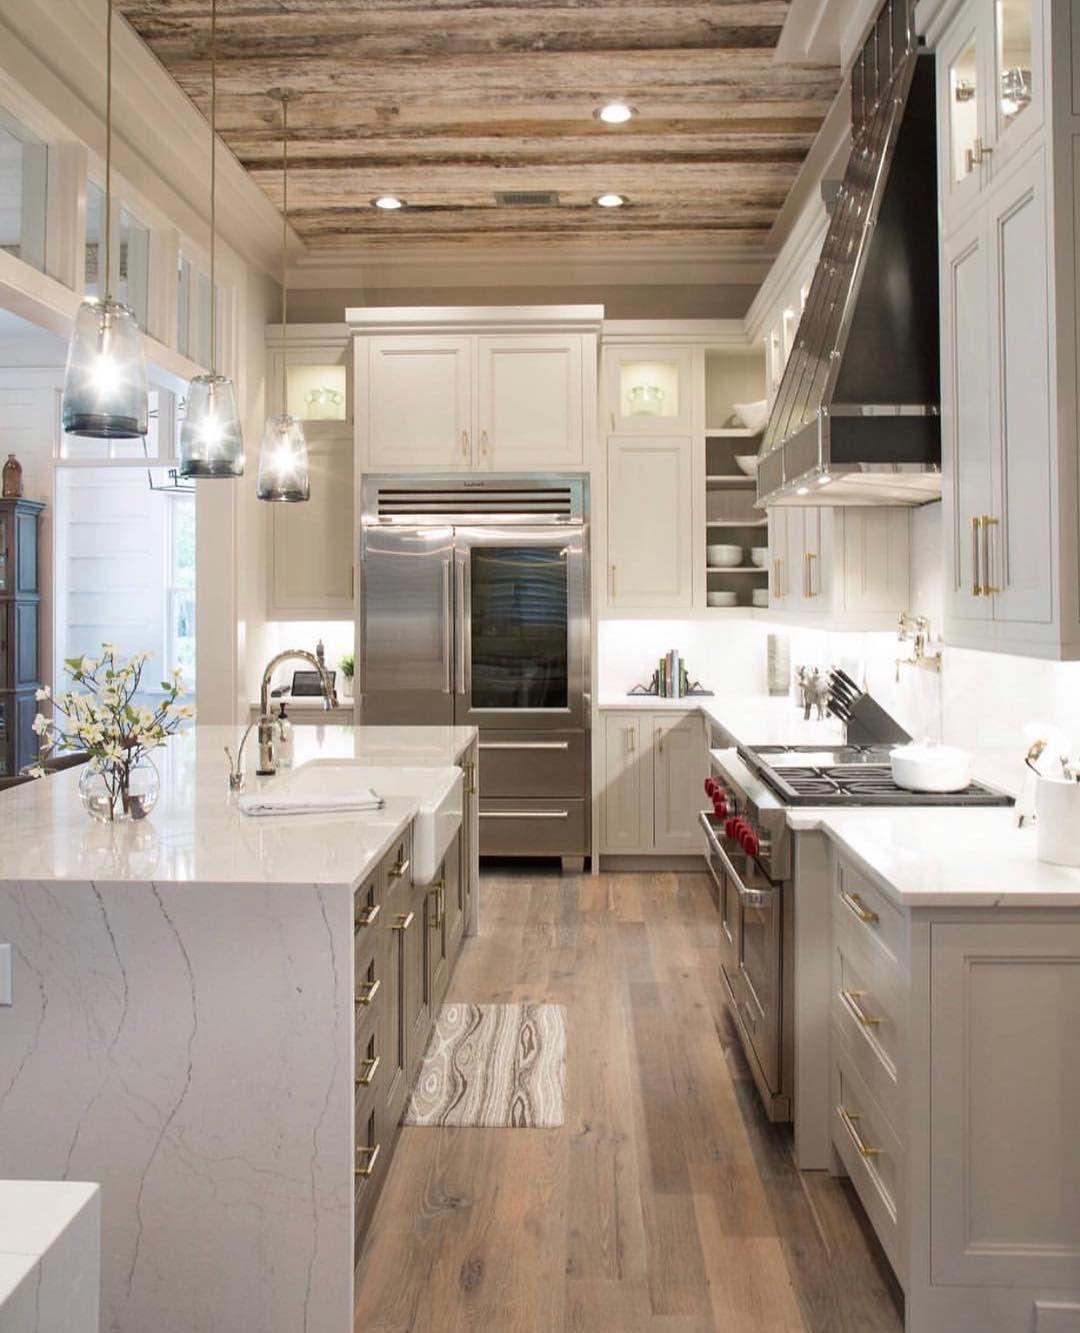 Interior design home decor on instagram  care you planning  kitchen remodel for also rh ar pinterest